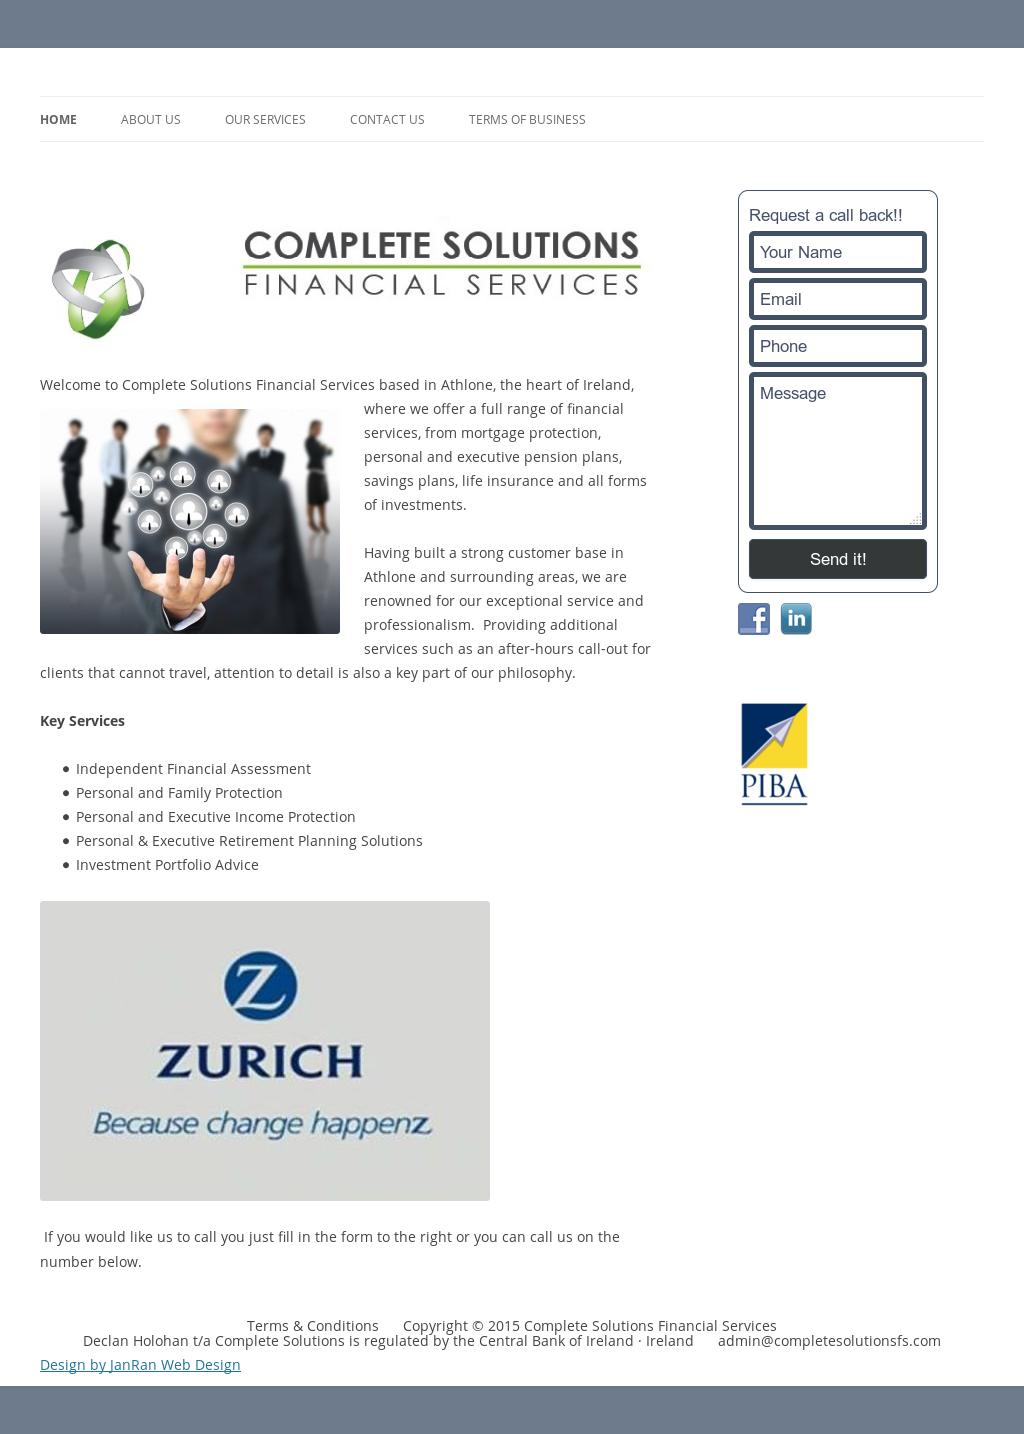 Complete Solutions Financial Services Competitors, Revenue